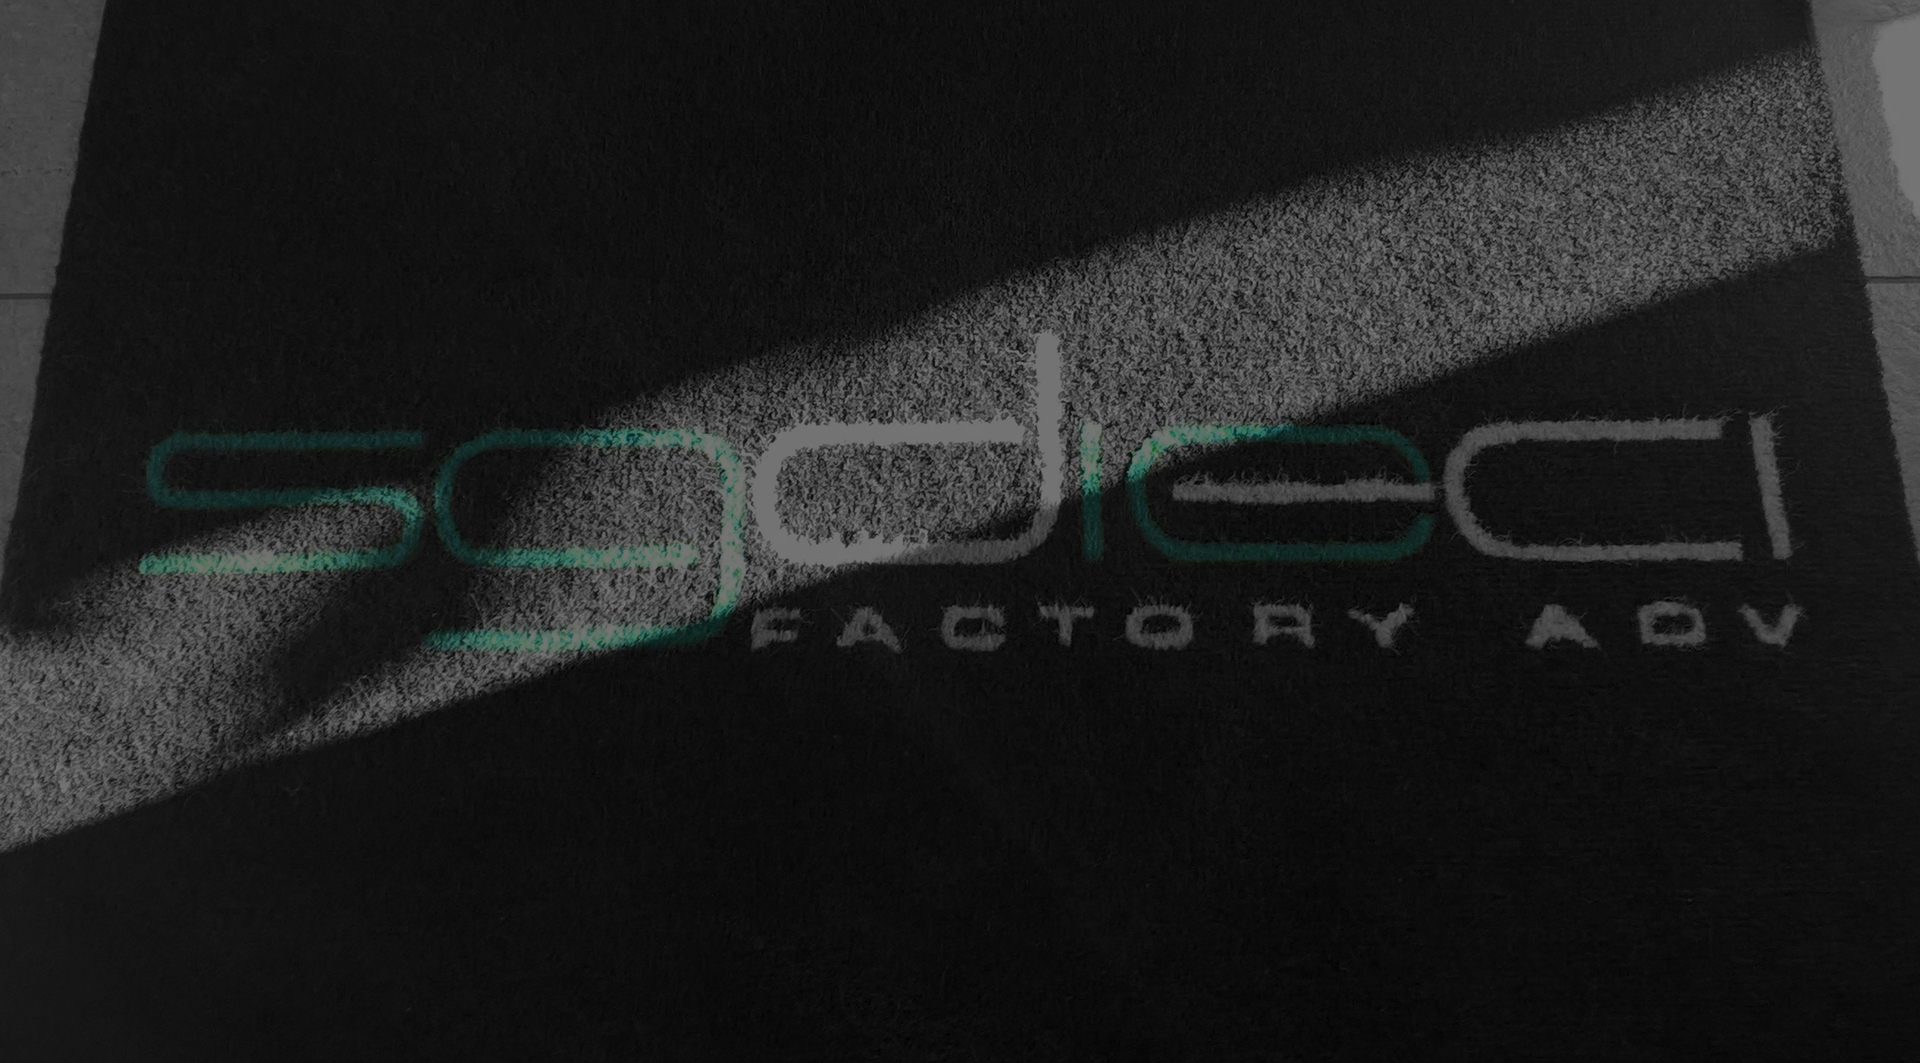 SG Dieci Factory ADV Torino